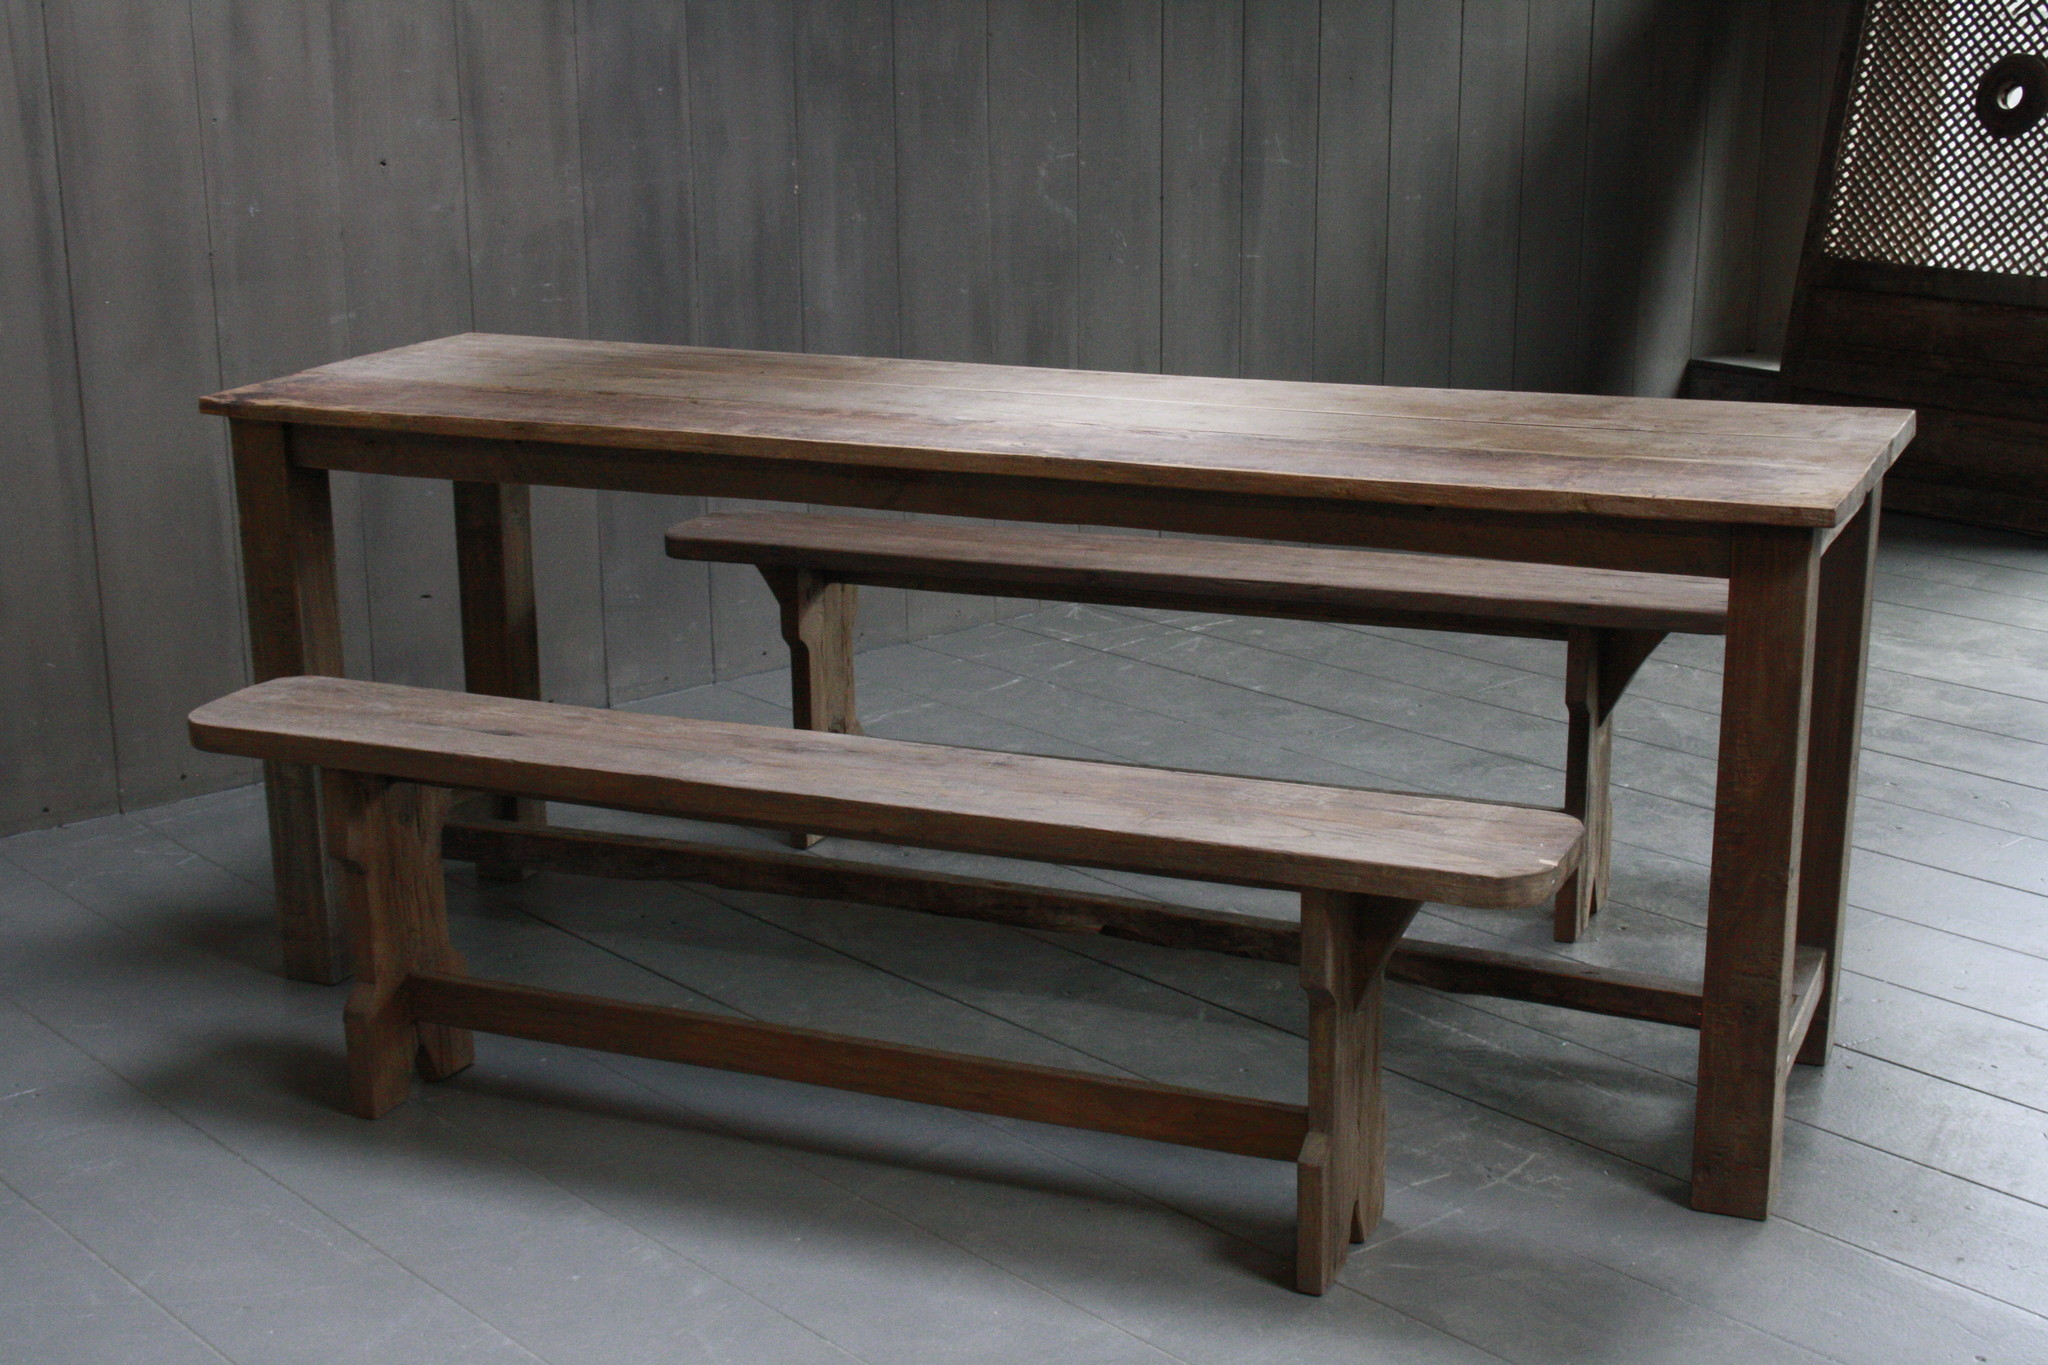 Oud houten eetkamer set met 2 houten bankjes-9